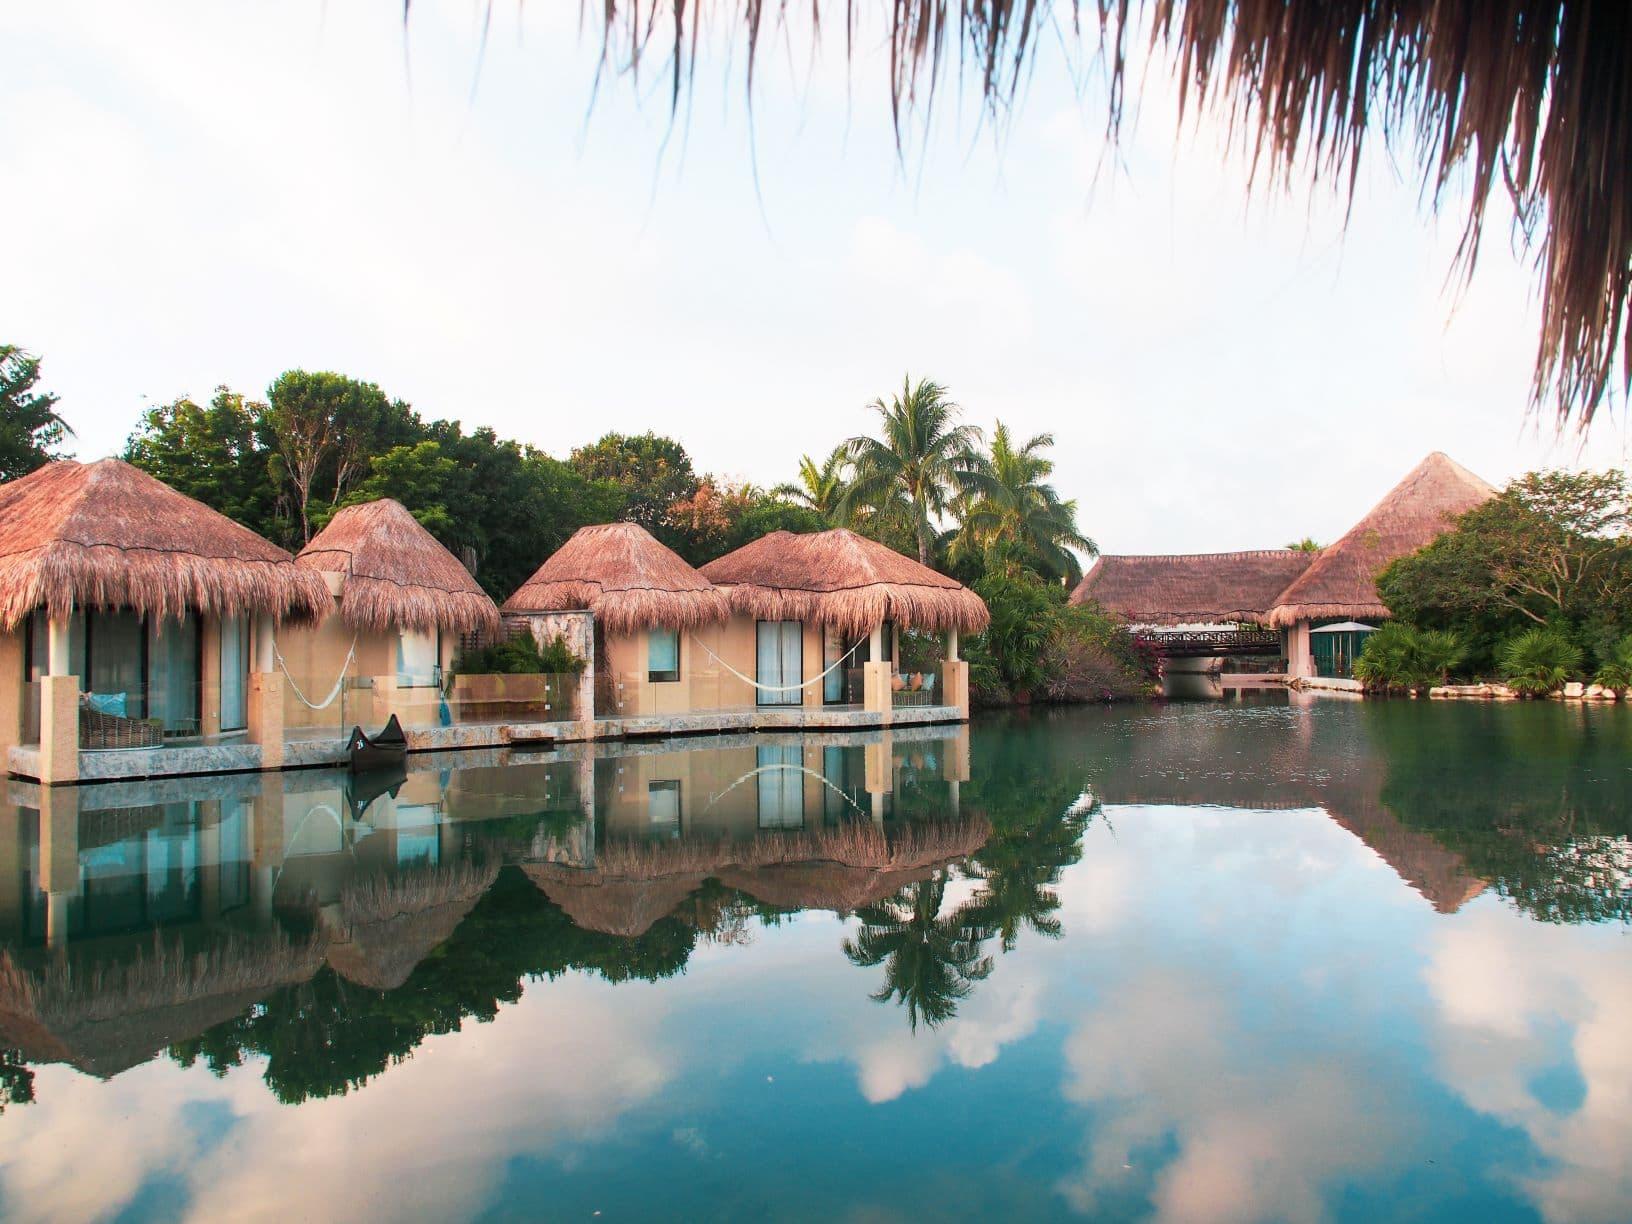 Hotelanlage in Yucatan